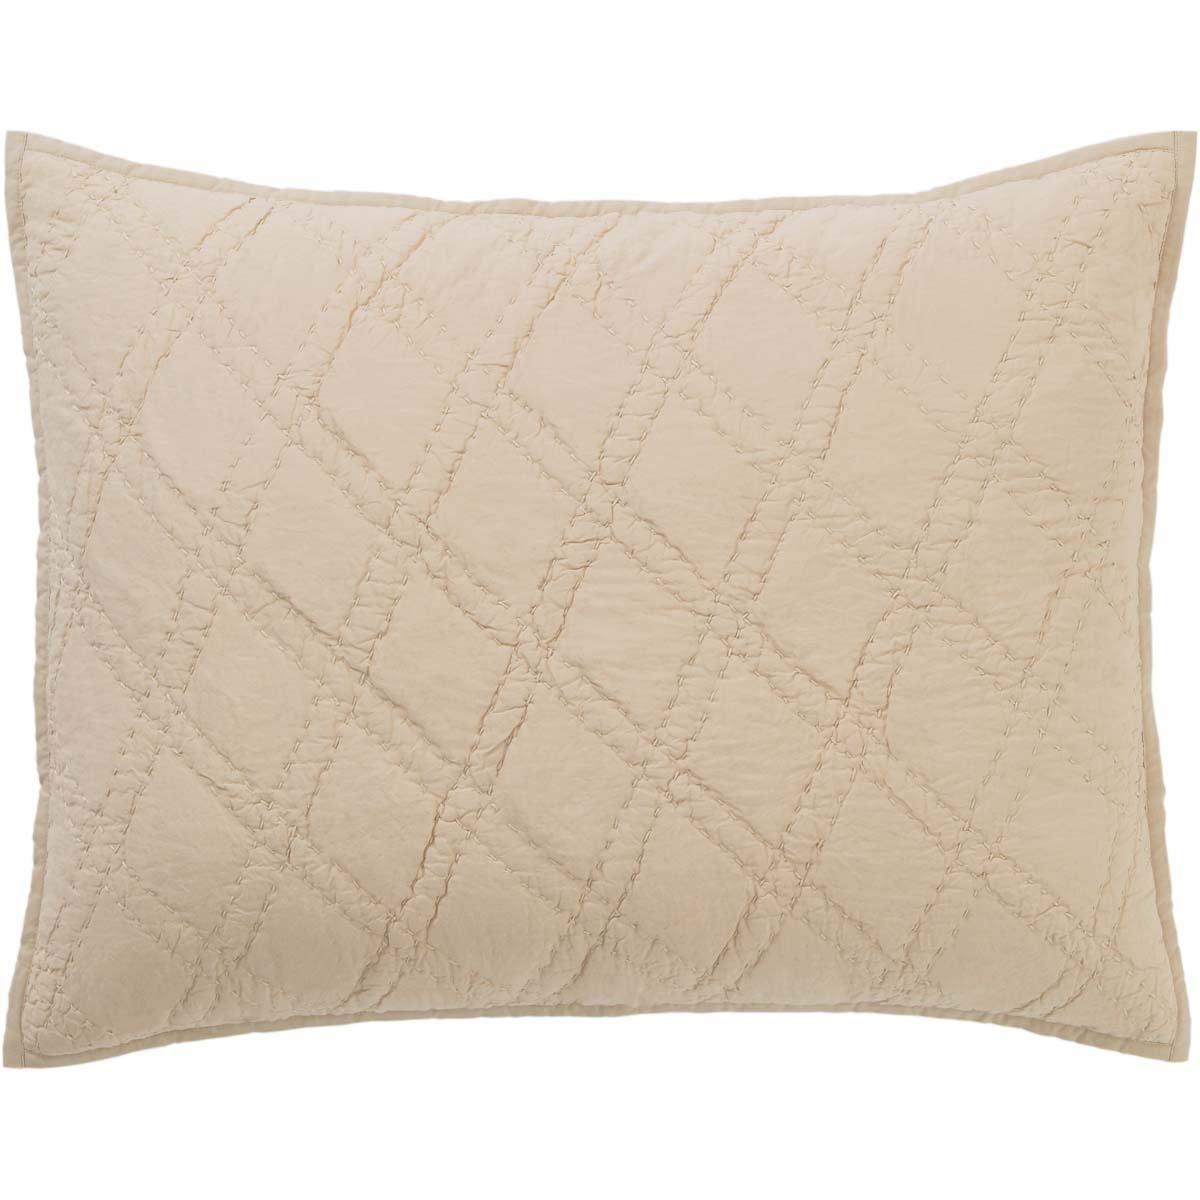 VHC Brands Farmhouse Bedding - Casey Grey Sham, Standard, Taupe